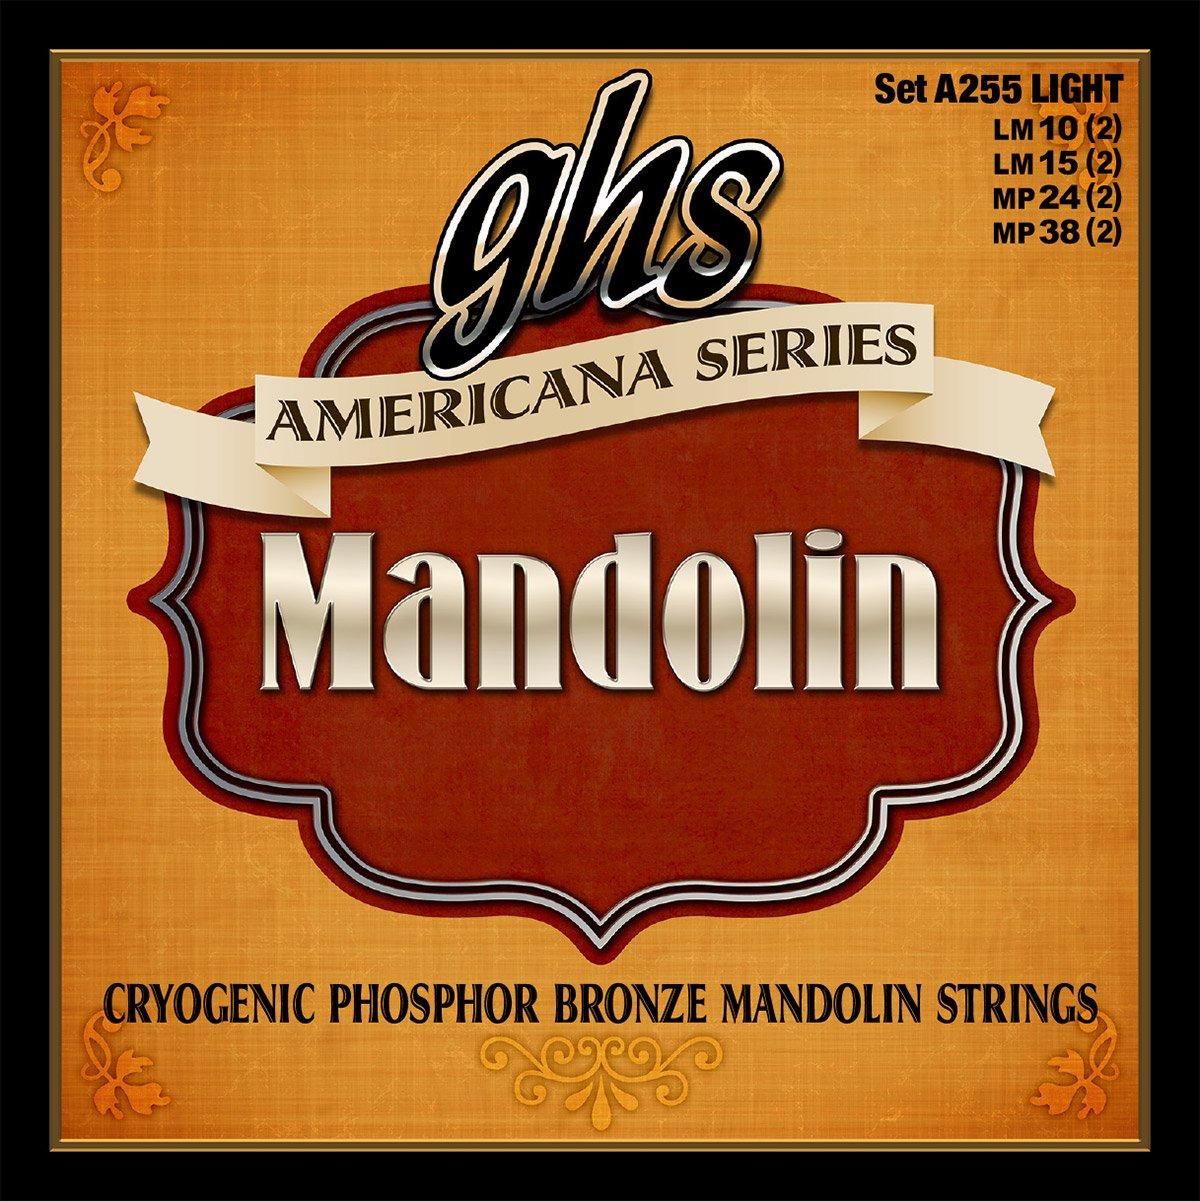 GHS Americana Series Light Mandolin Strings (A255)